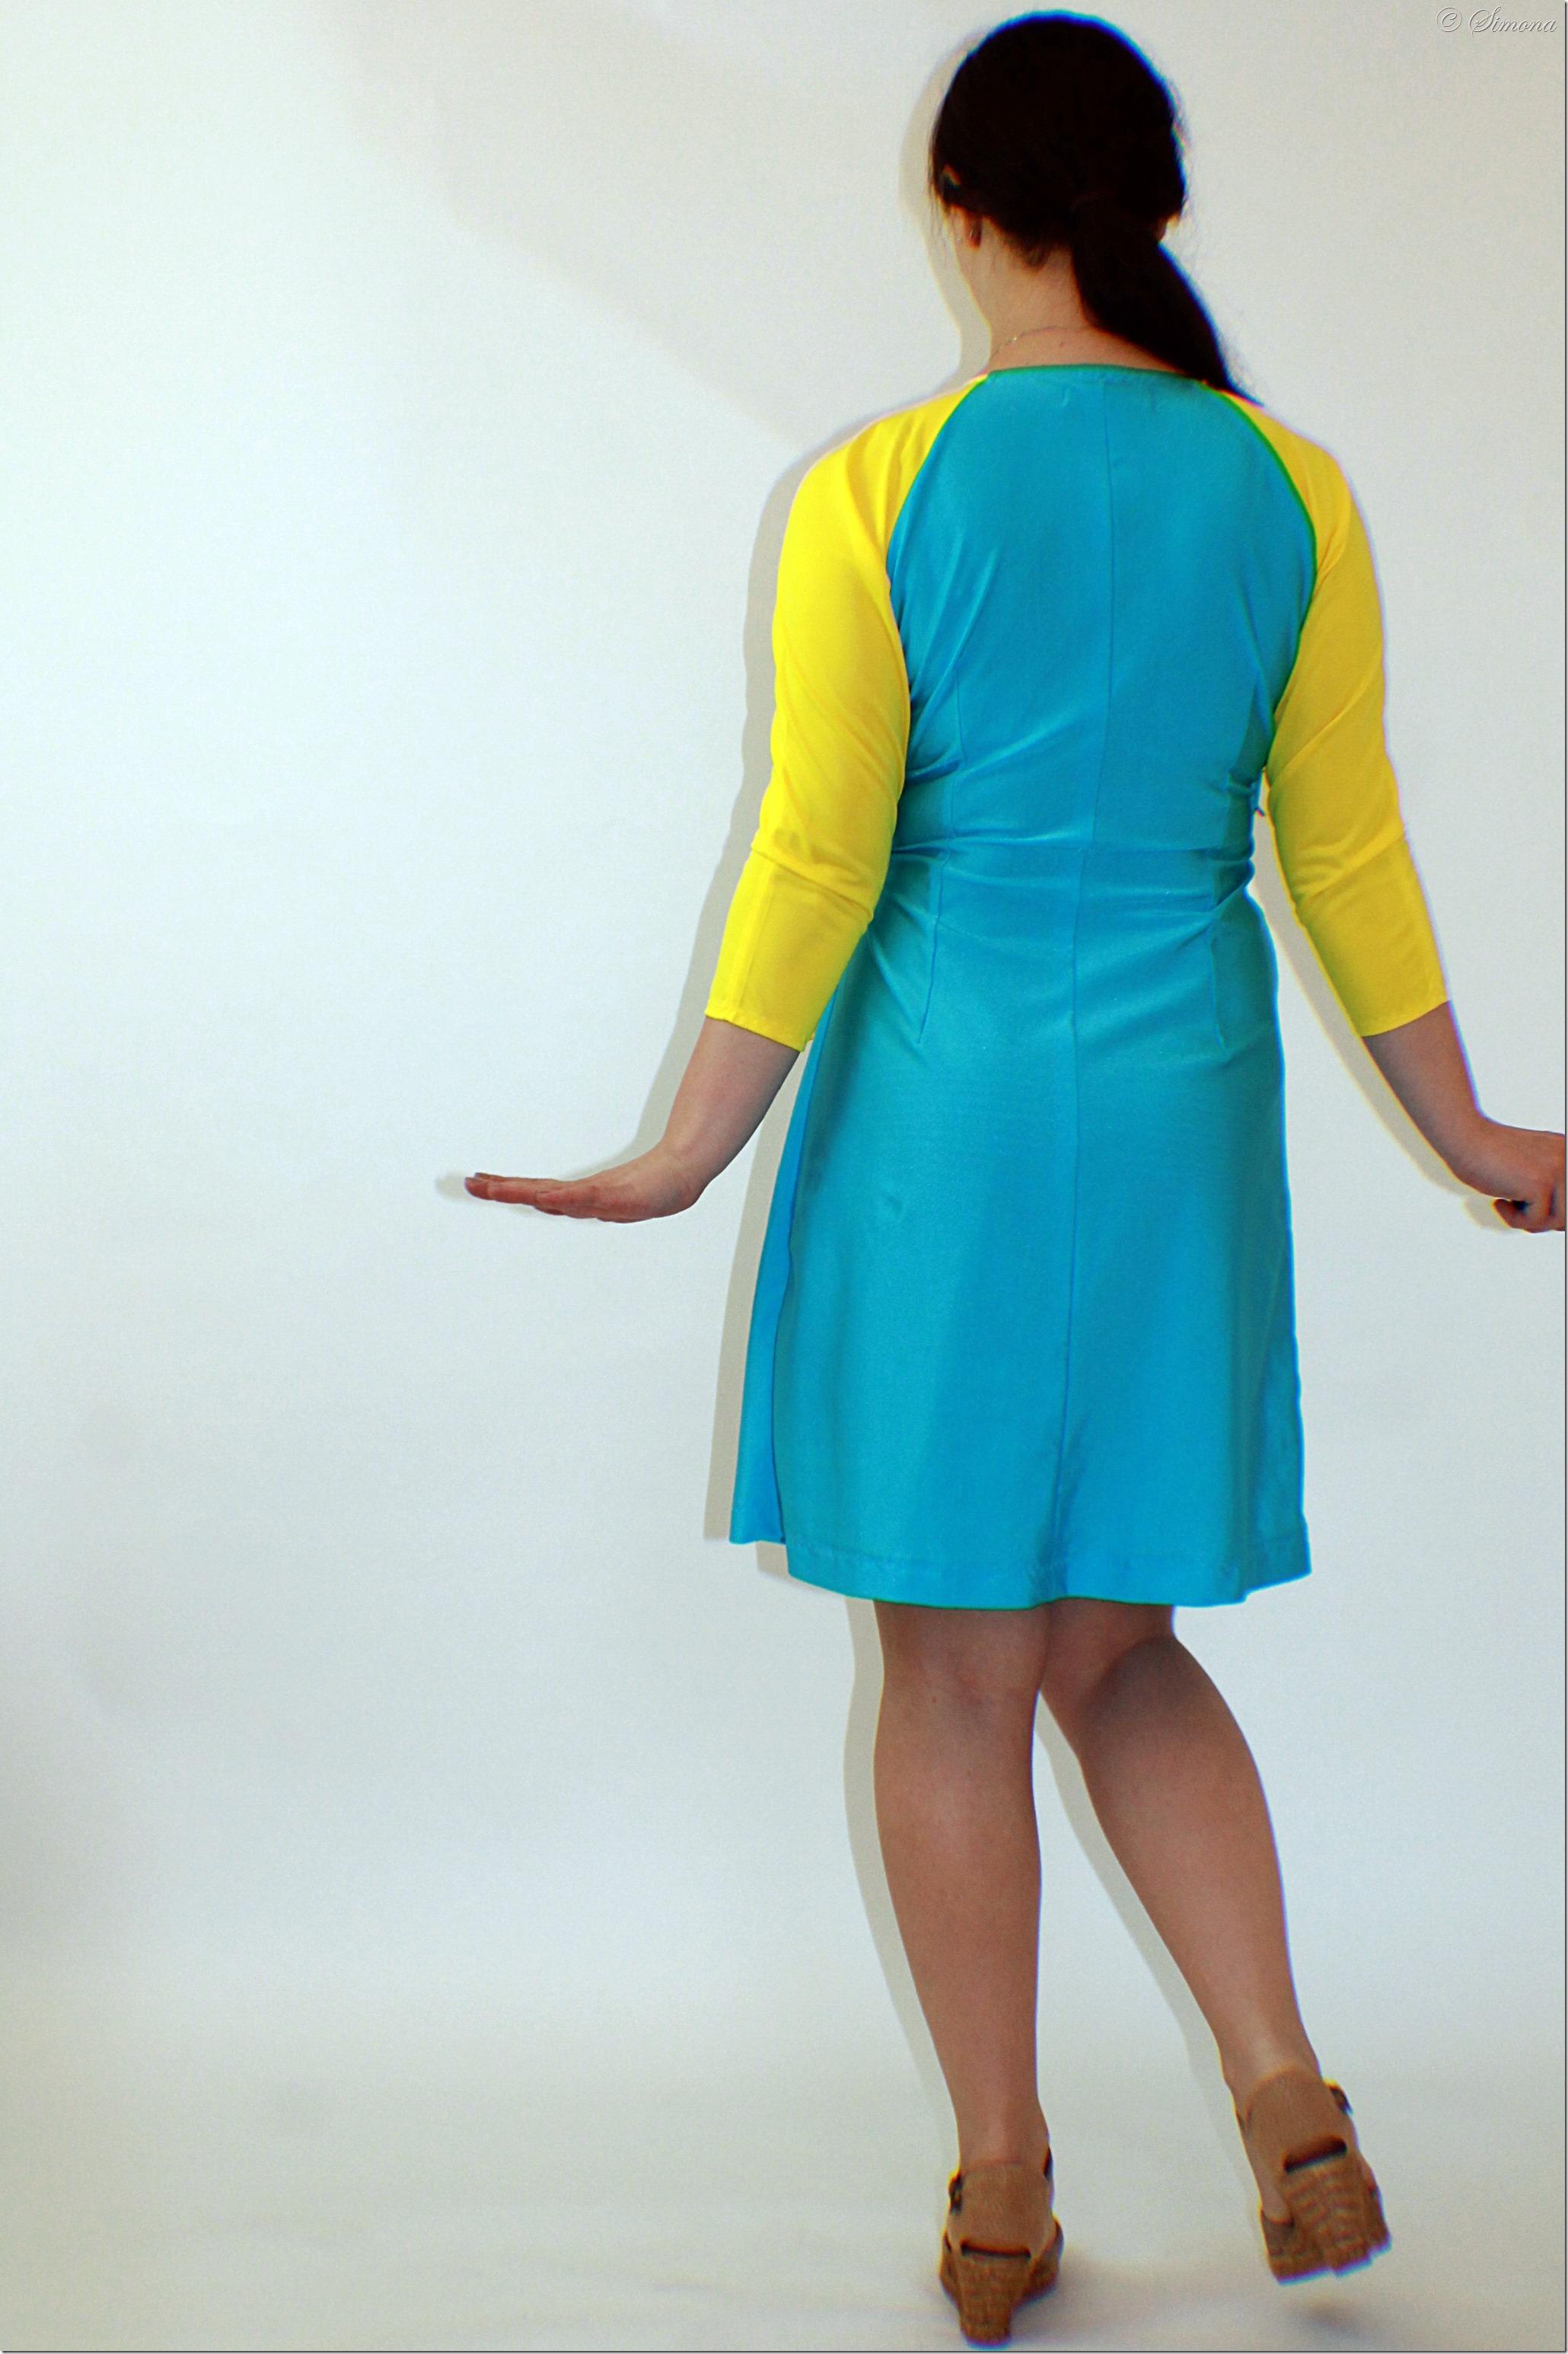 Simplicity dress 38